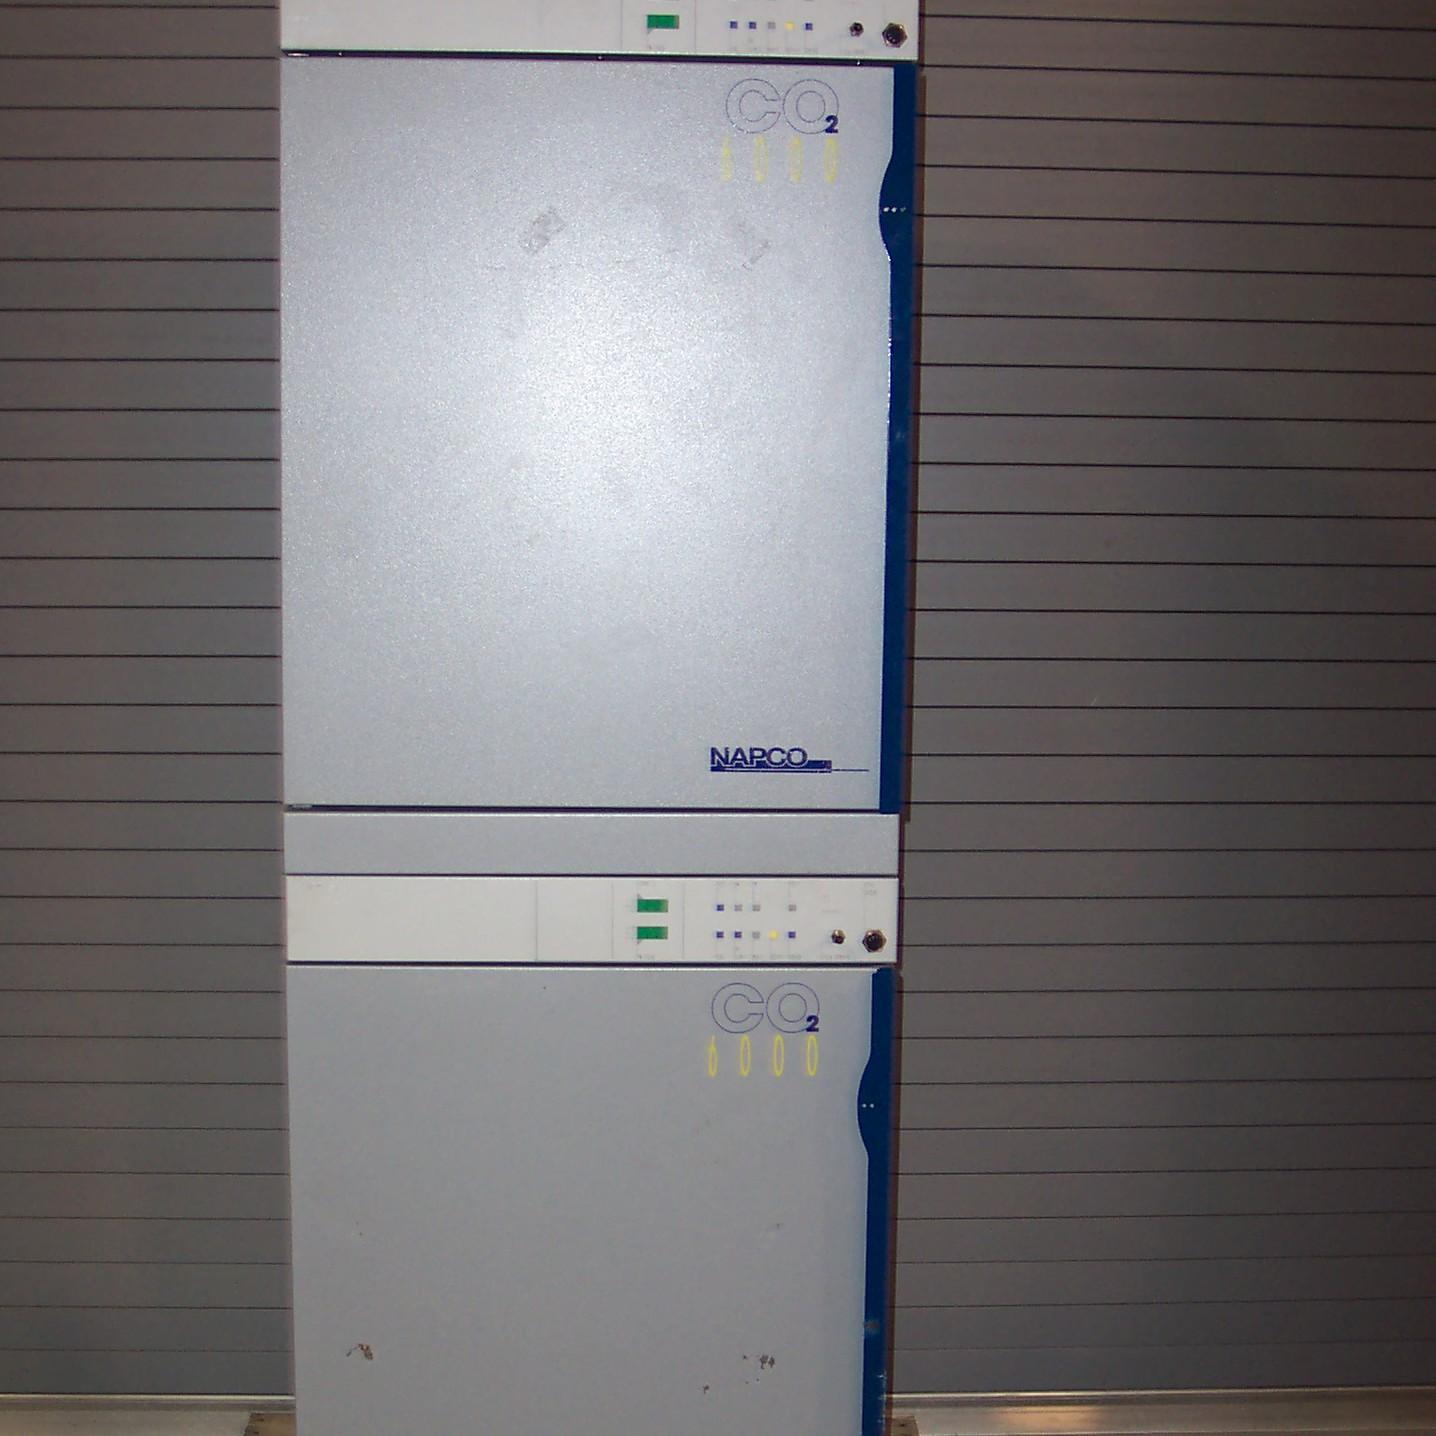 CO2 6000 Incubator Name